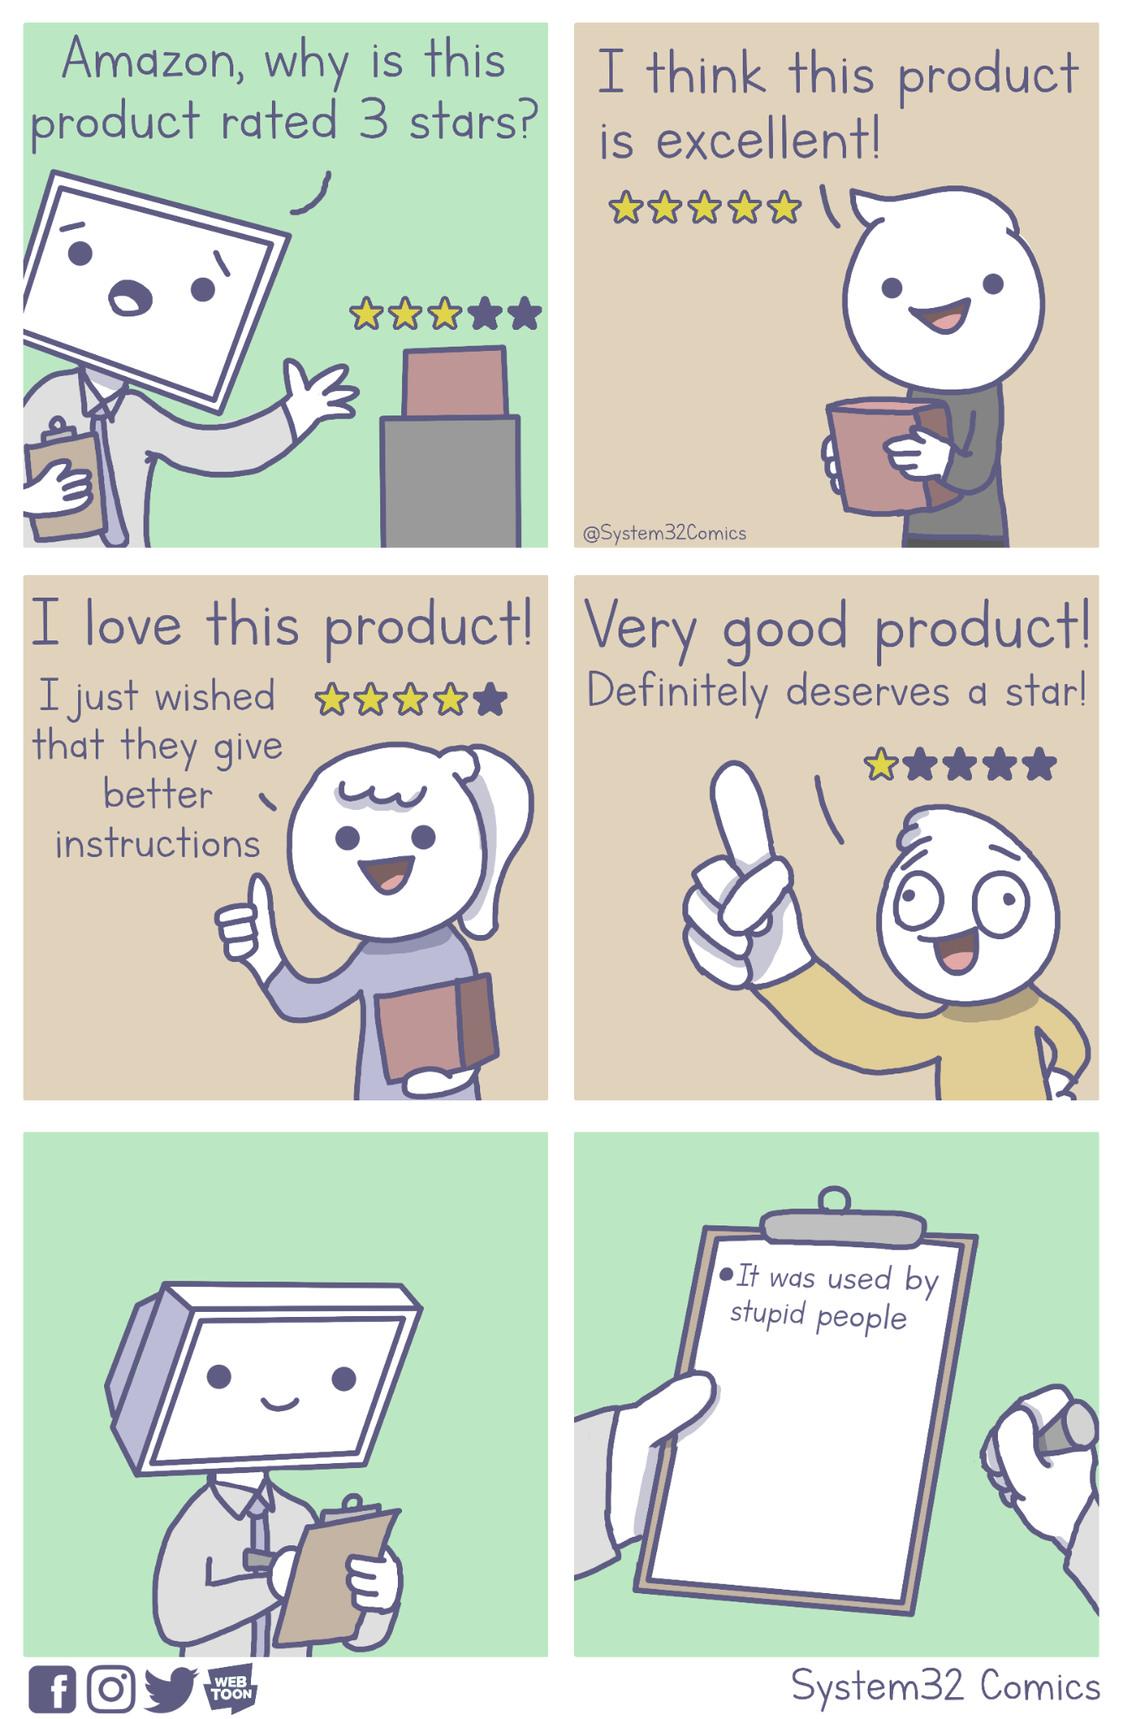 Amazon Reviews [OC] - meme